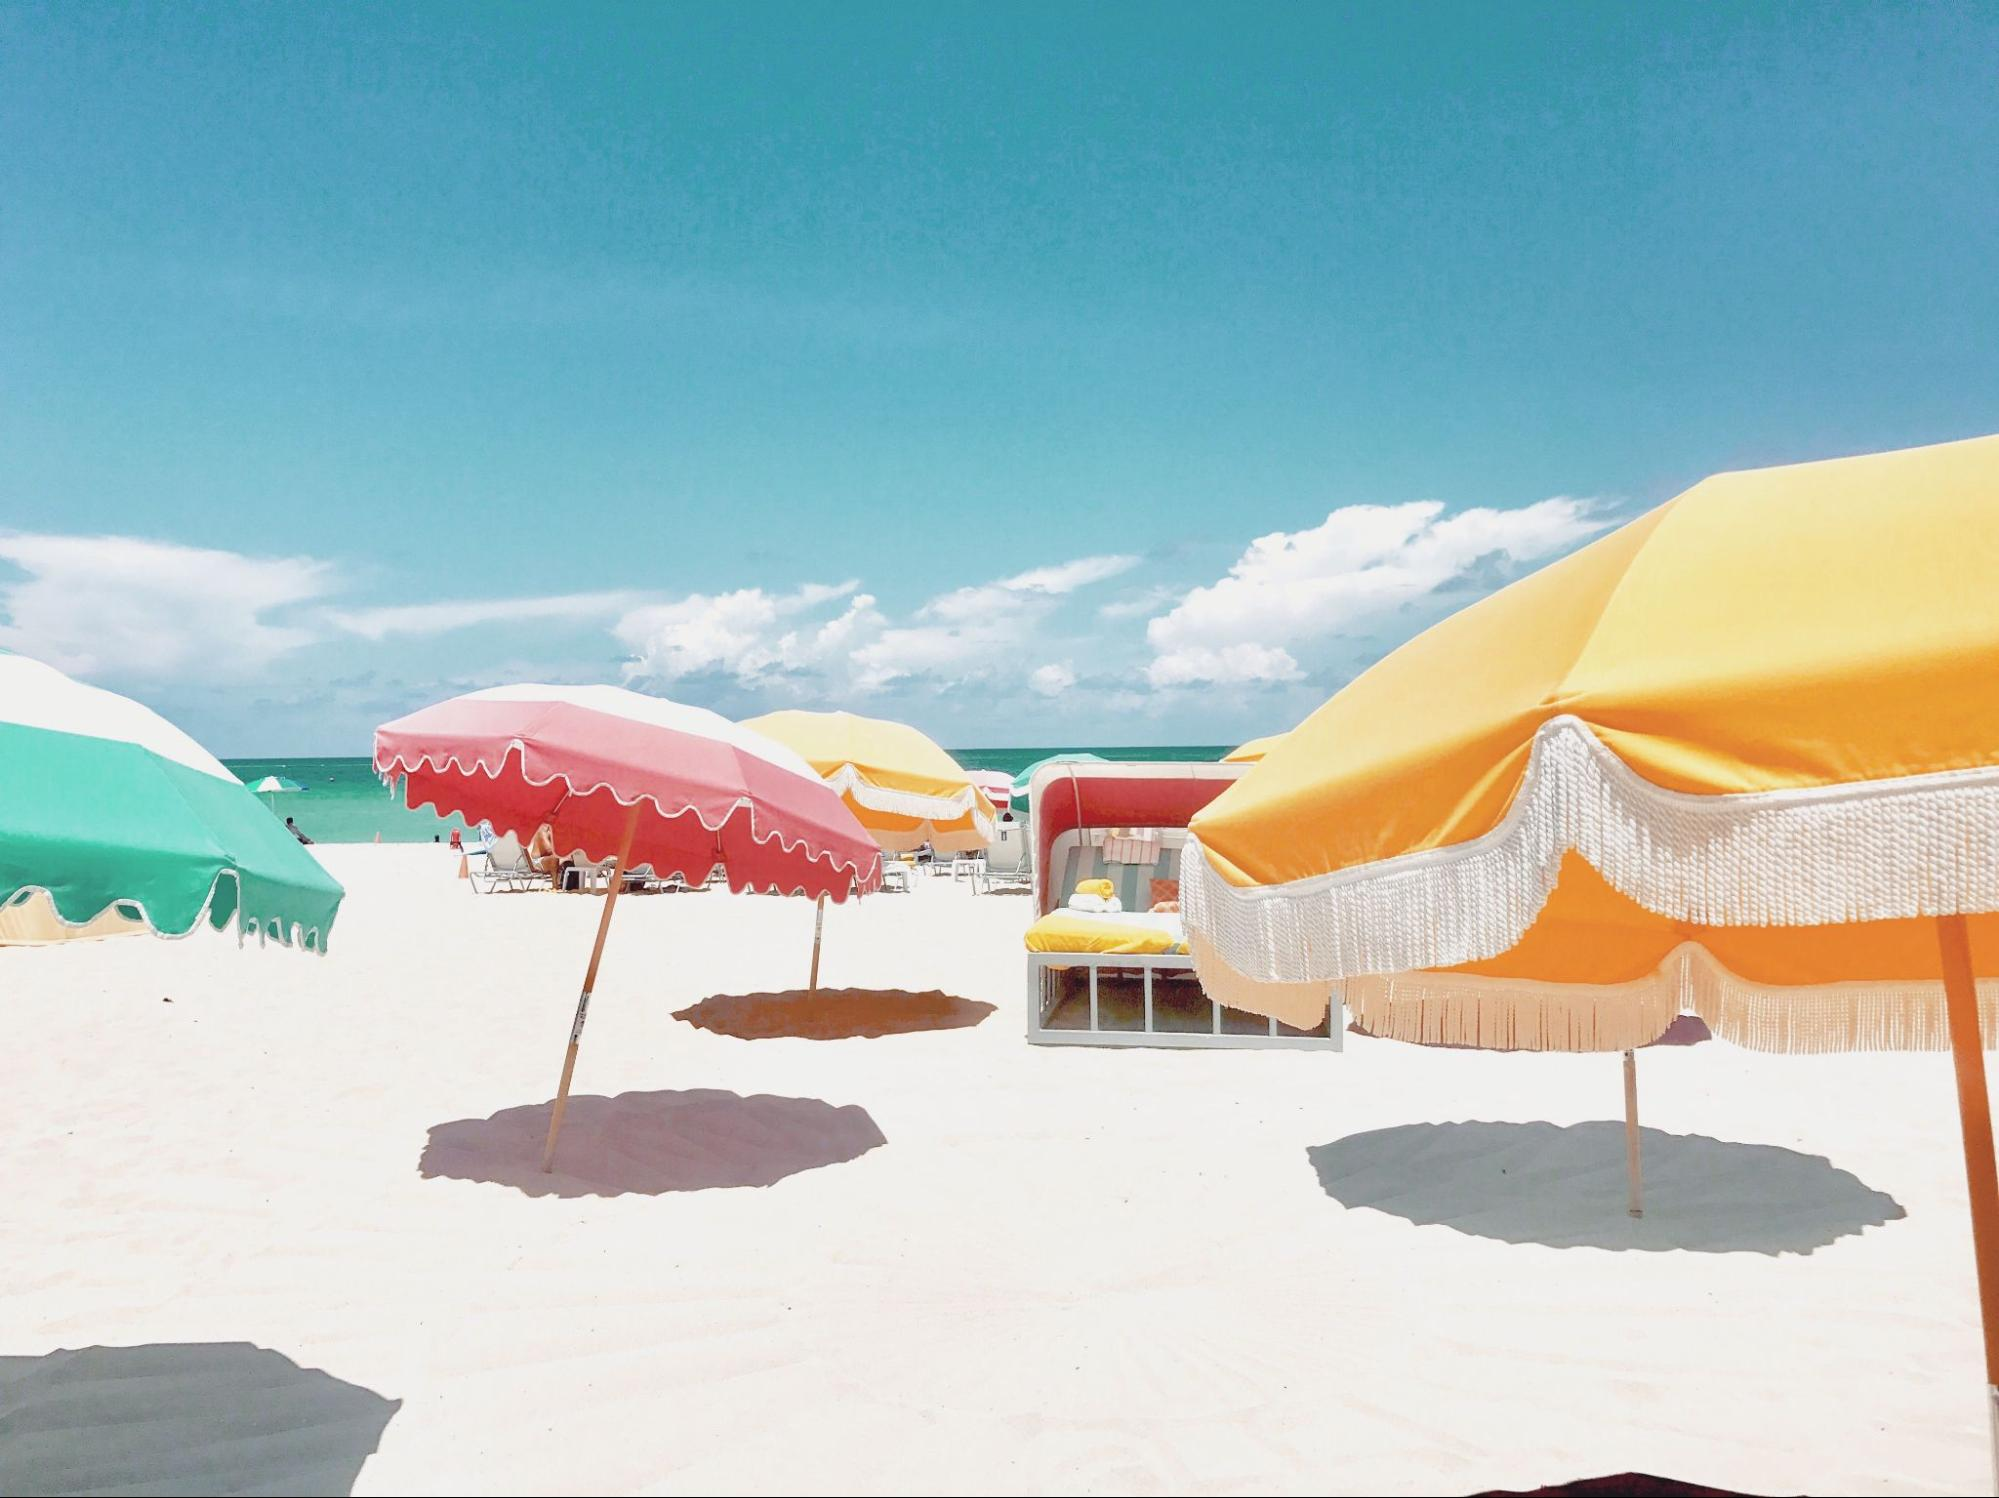 Umbrellas on the beach in Miami, Florida